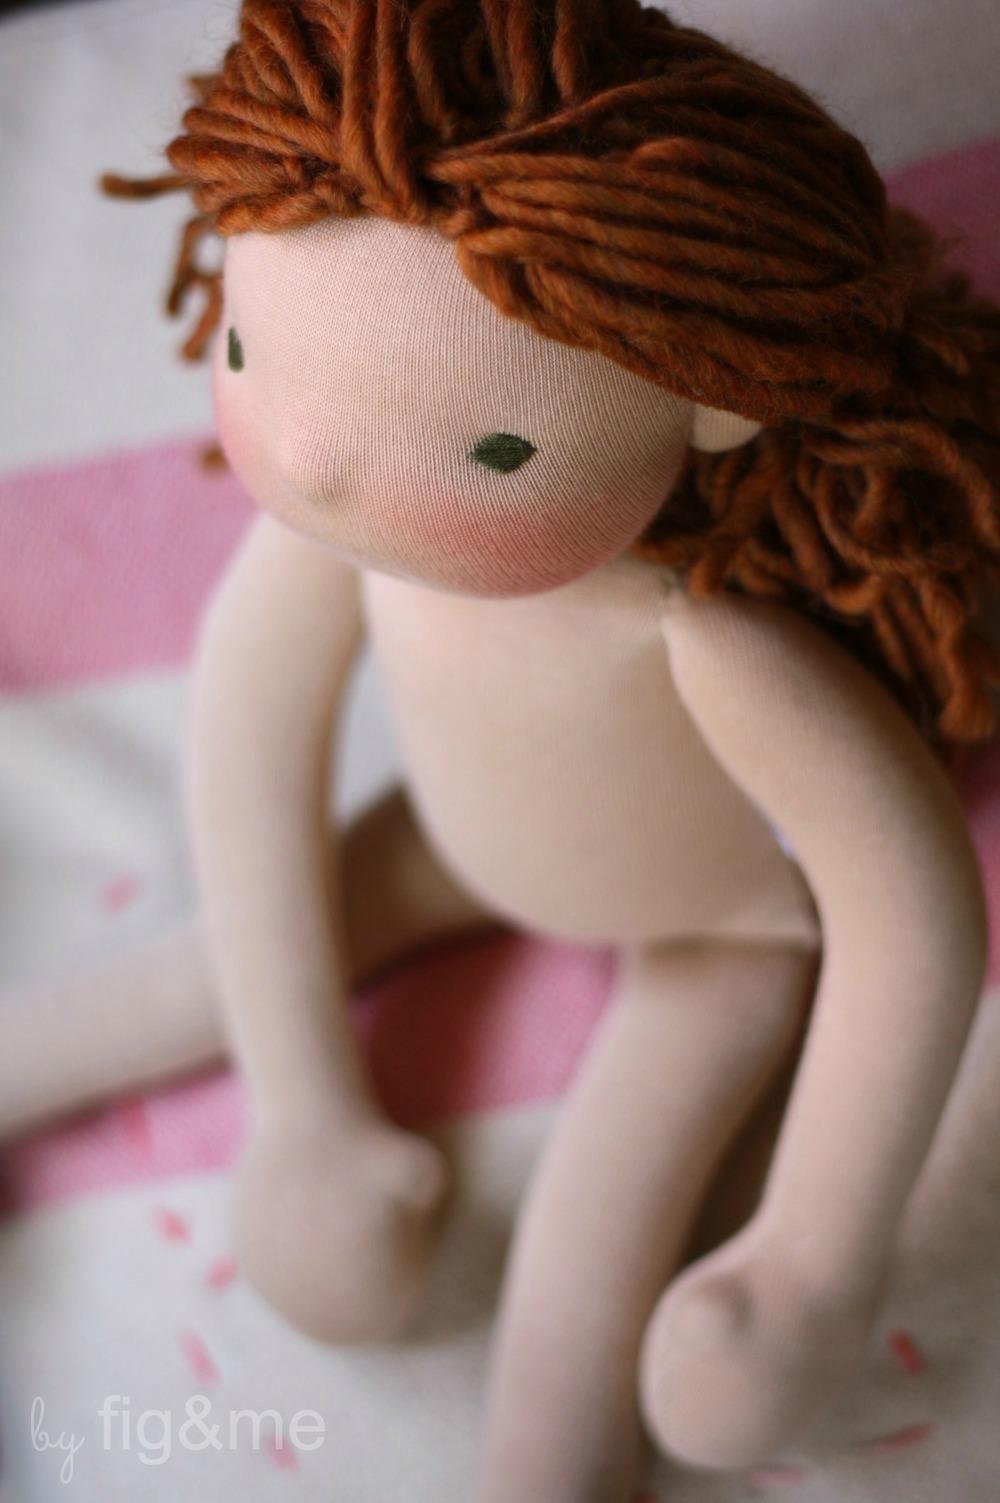 Penelope-doll-figandme.jpg